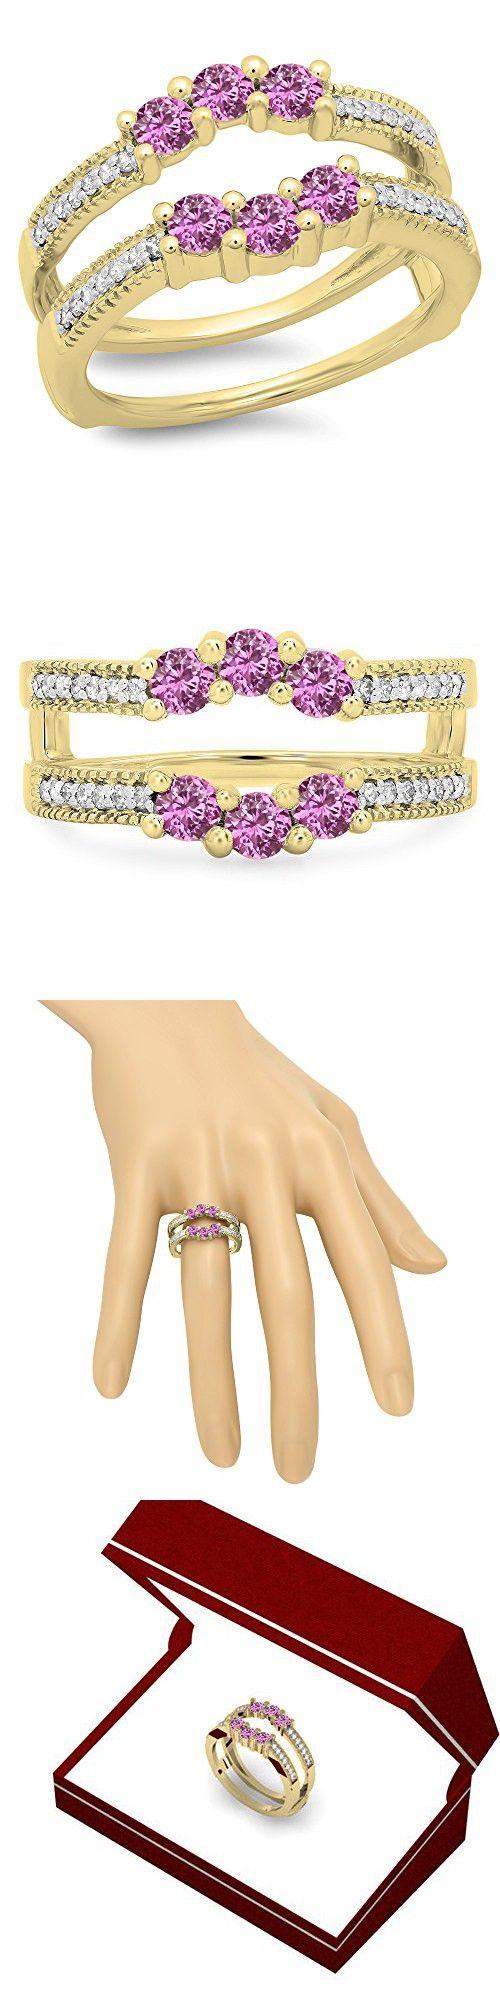 c8fc56603d3eb DazzlingRock Collection 14K Gold Round Cut Pink Sapphire & White ...